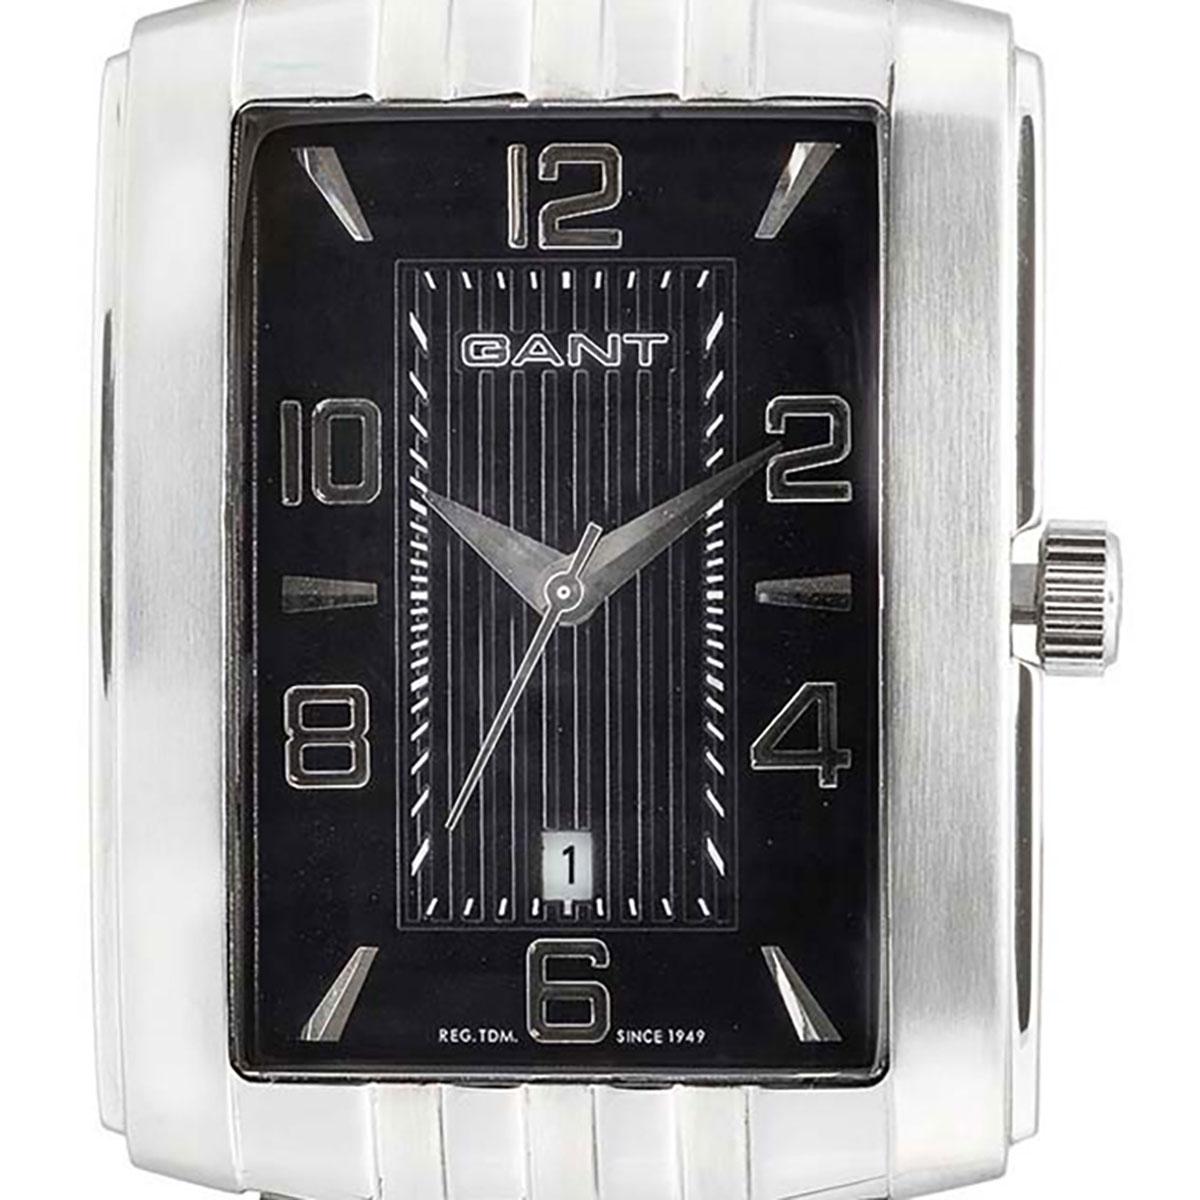 GANT ガント 電池式クォーツ 腕時計 [W10681] 並行輸入品 ブラック(黒)